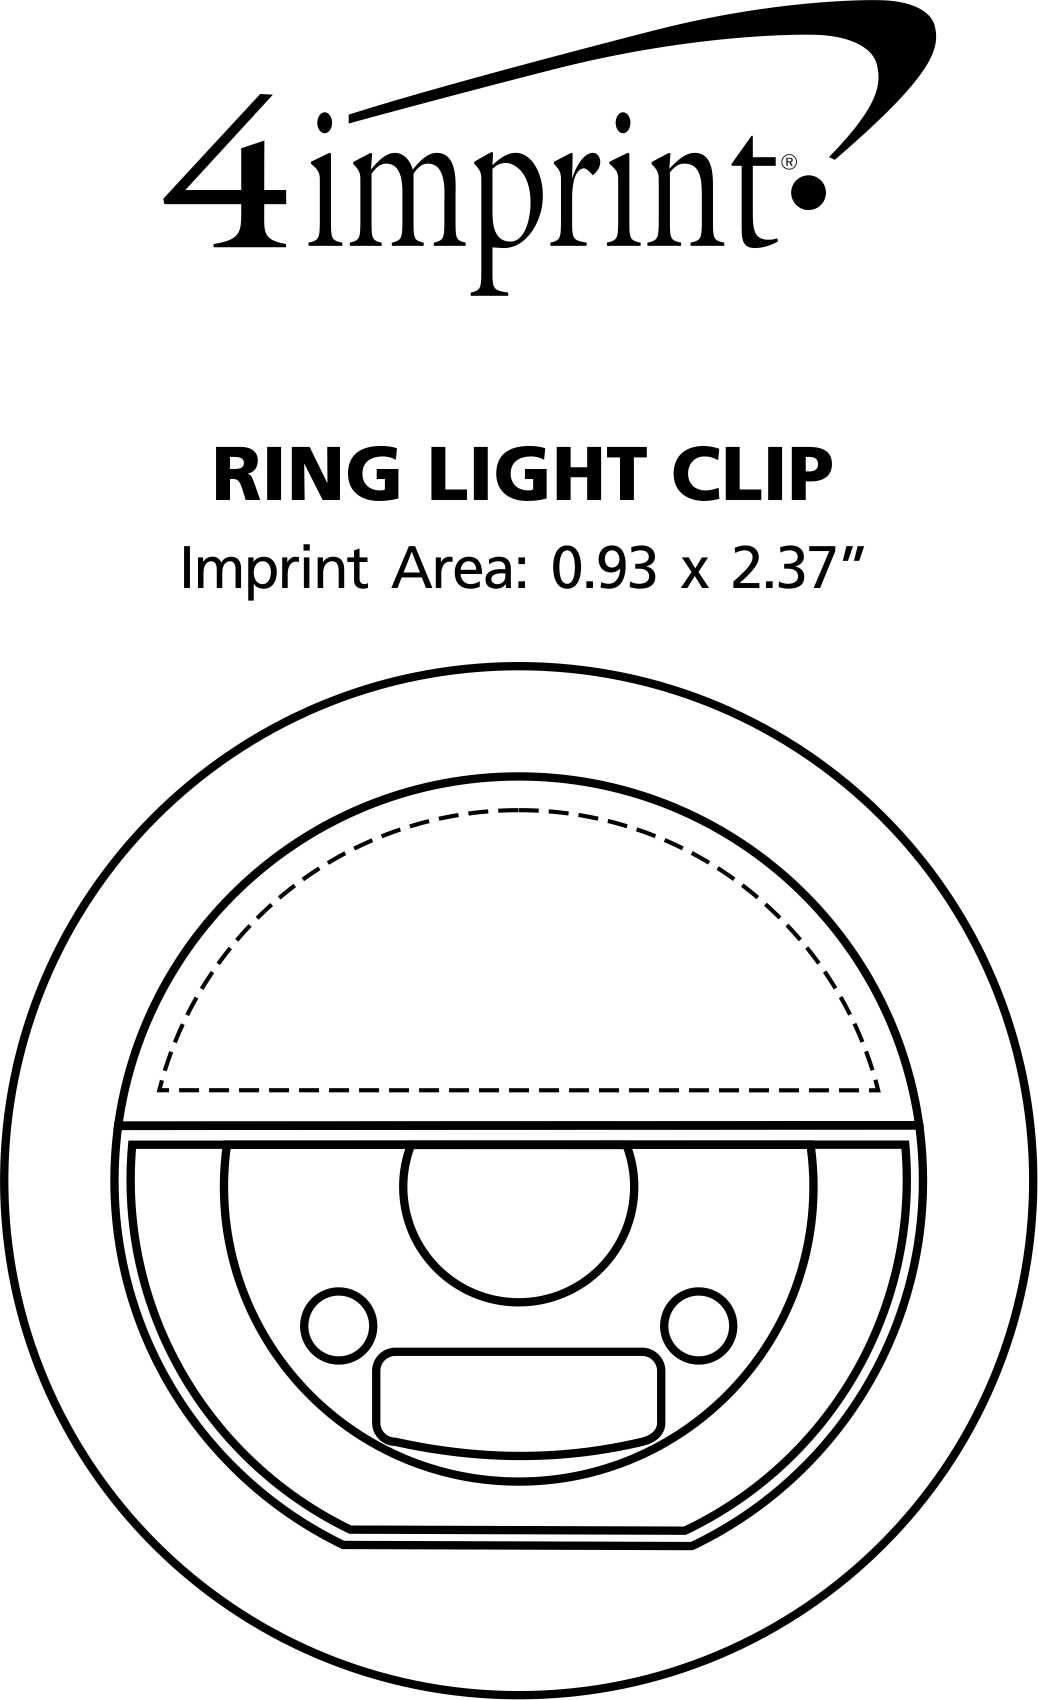 Imprint Area of Ring Light Clip